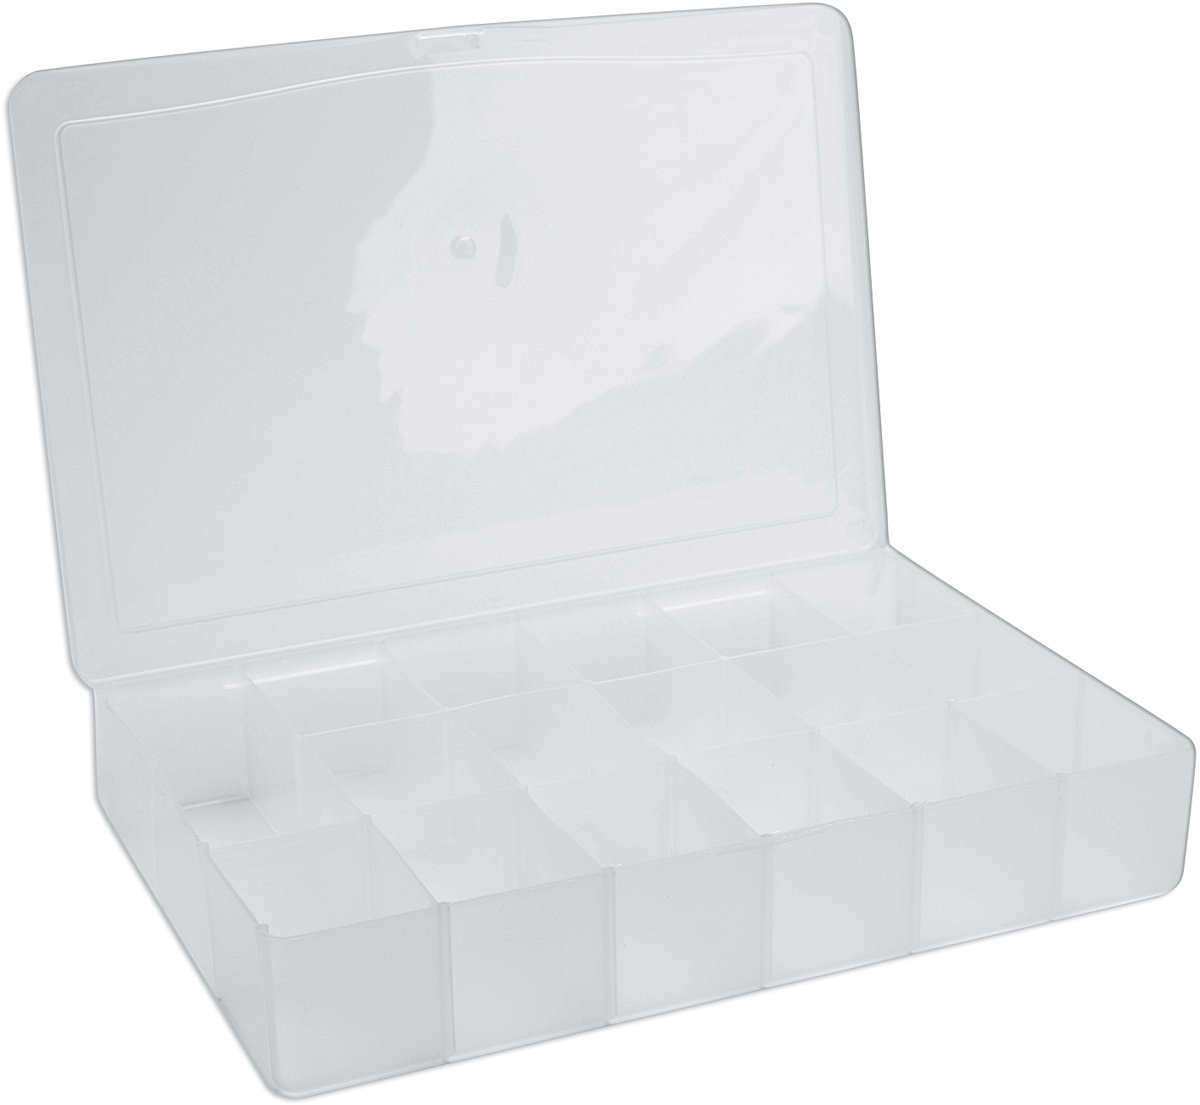 Darice Floss Caddy 17 Compartment 7X10 1//2X1 1//2 10674 3-Pack Bulk Buy